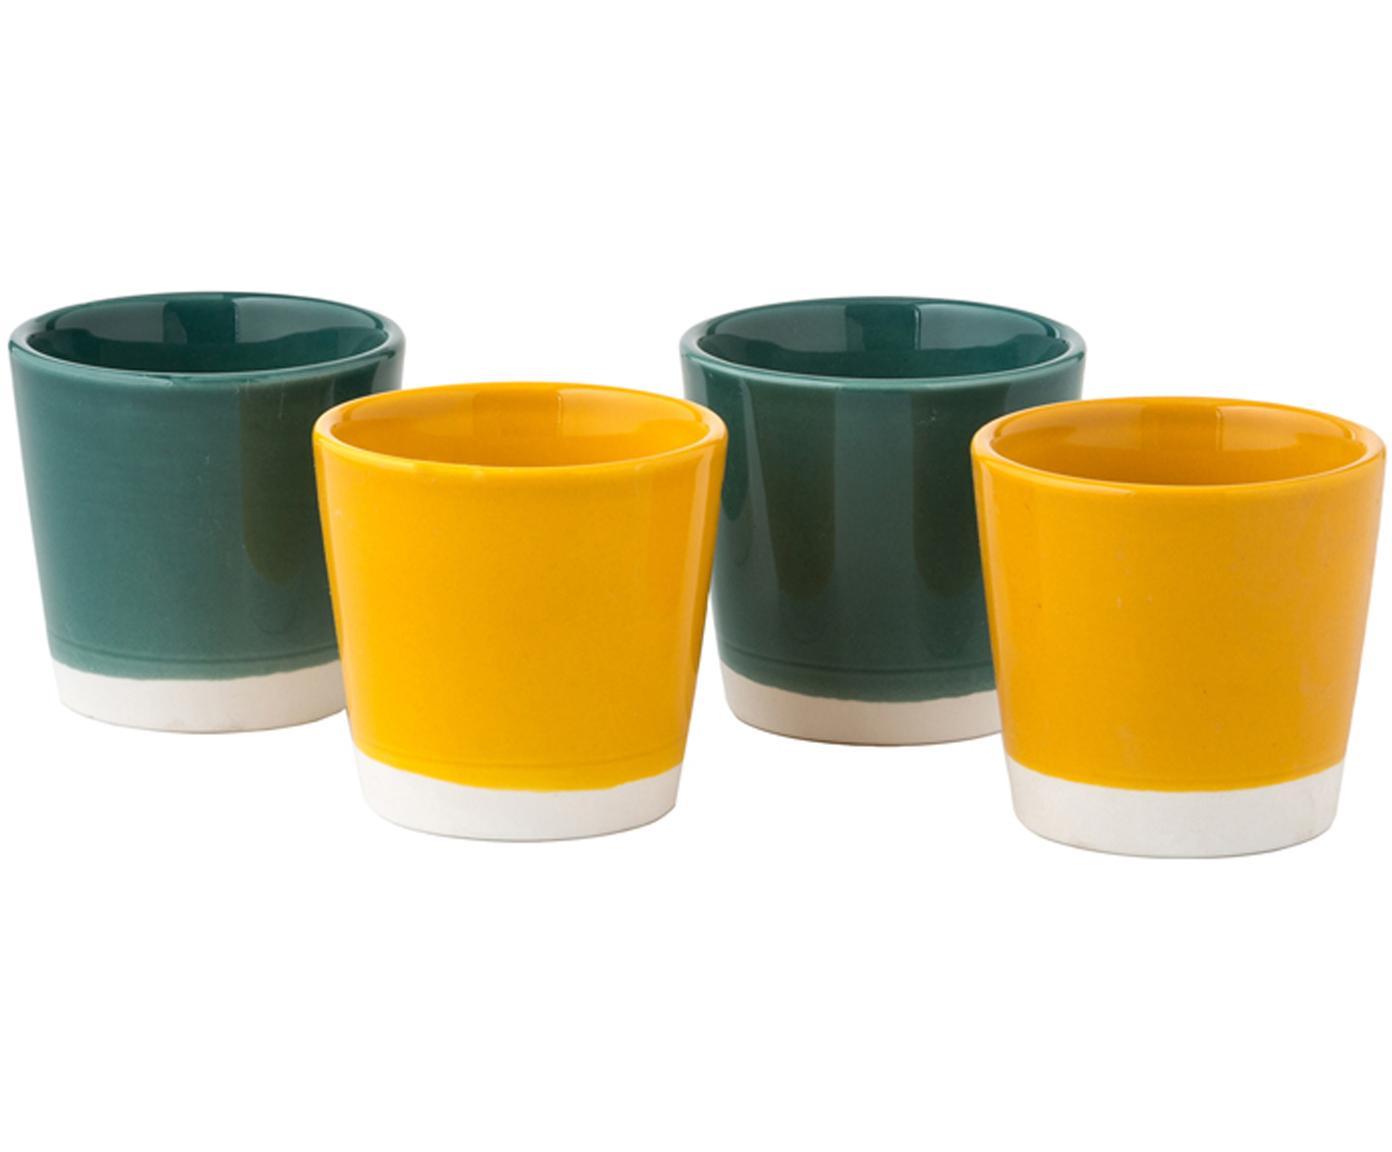 Espressobecher Yen in Gelb/Grün, 4er-Set, Sandstein, Tassen 1 und 2: Weiss, GrünTassen 3 und 4: Weiss, Gelb, Ø 7 x H 6 cm